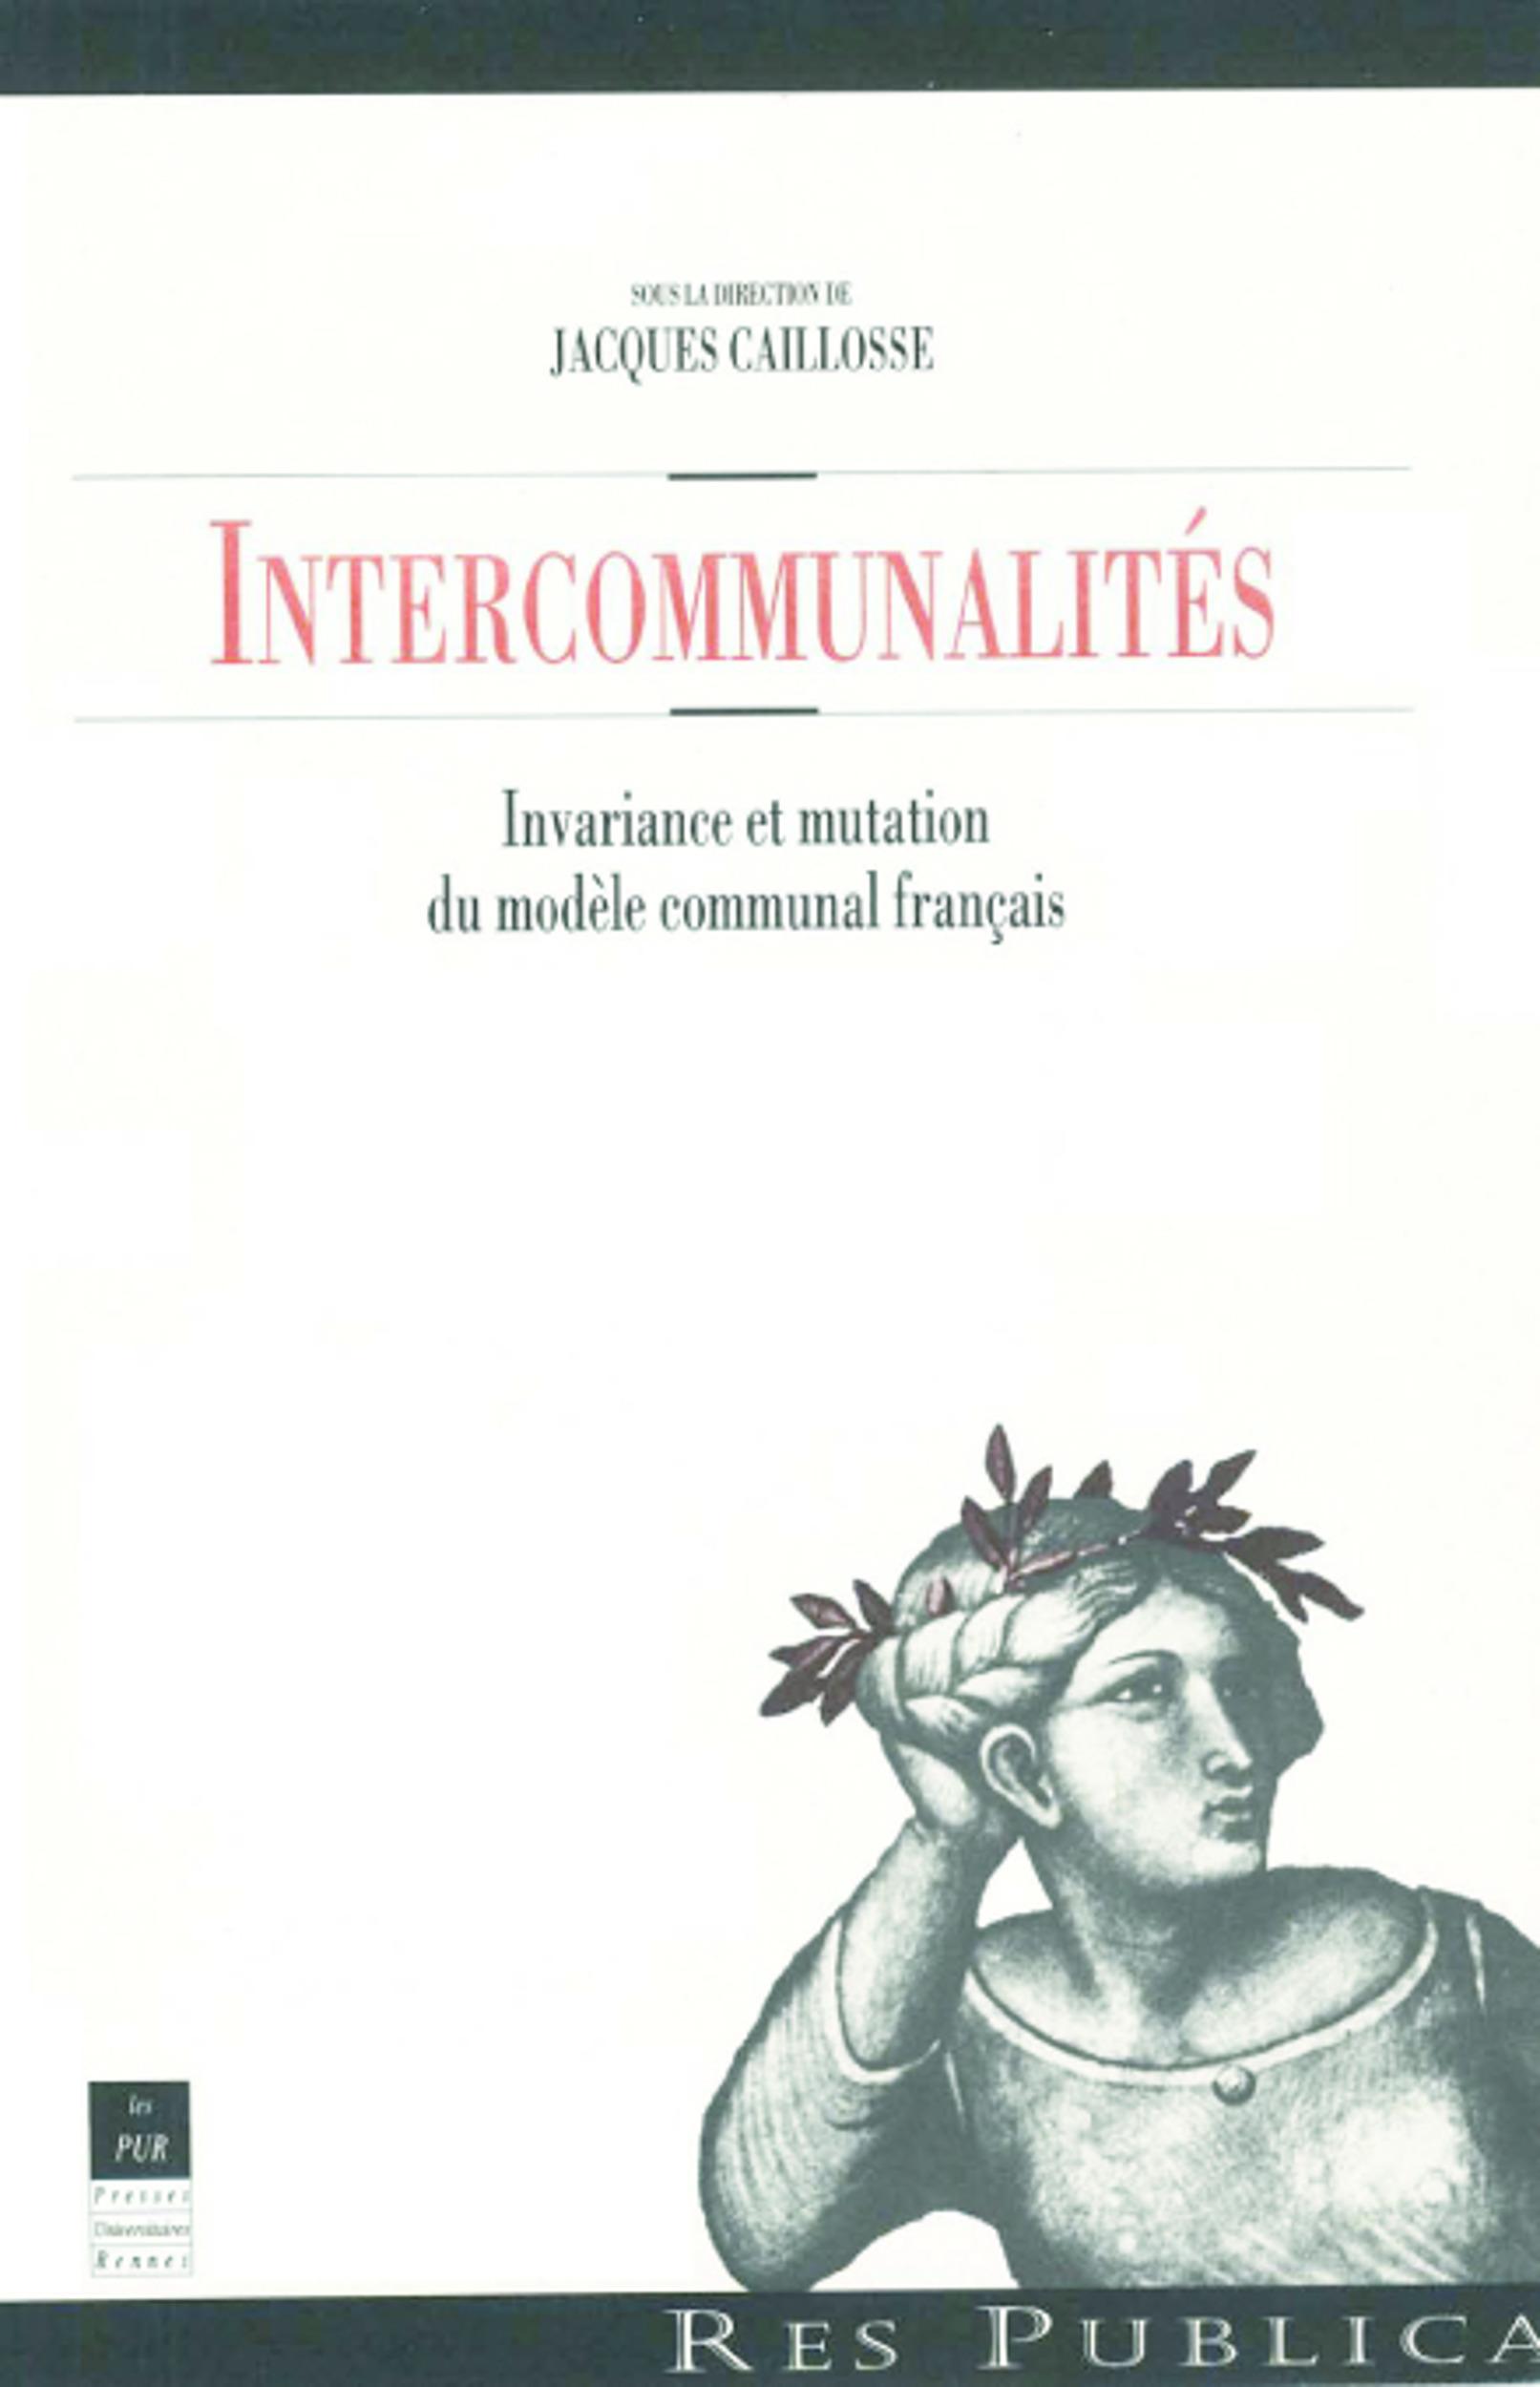 Intercommunalites